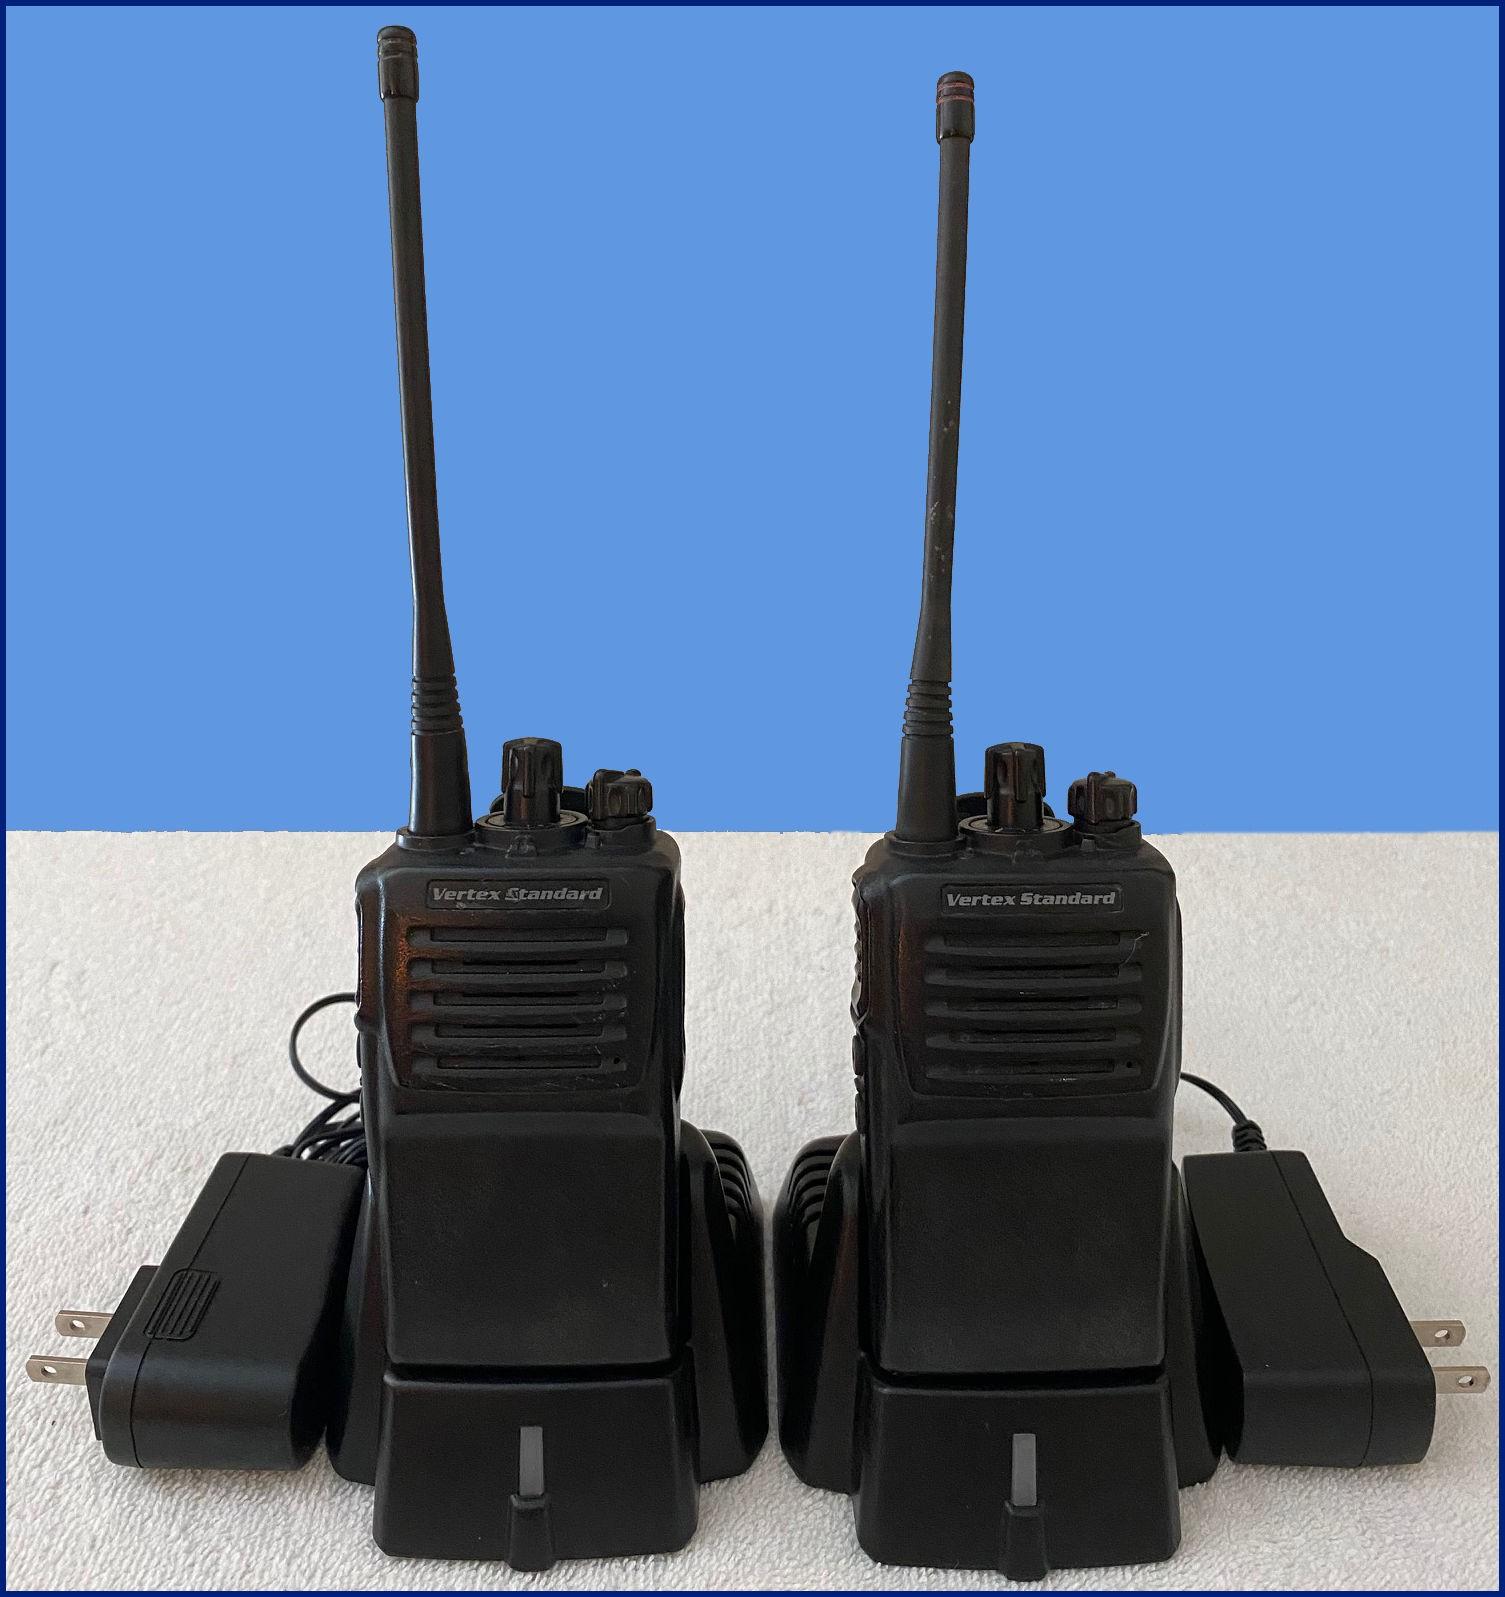 radios2pack